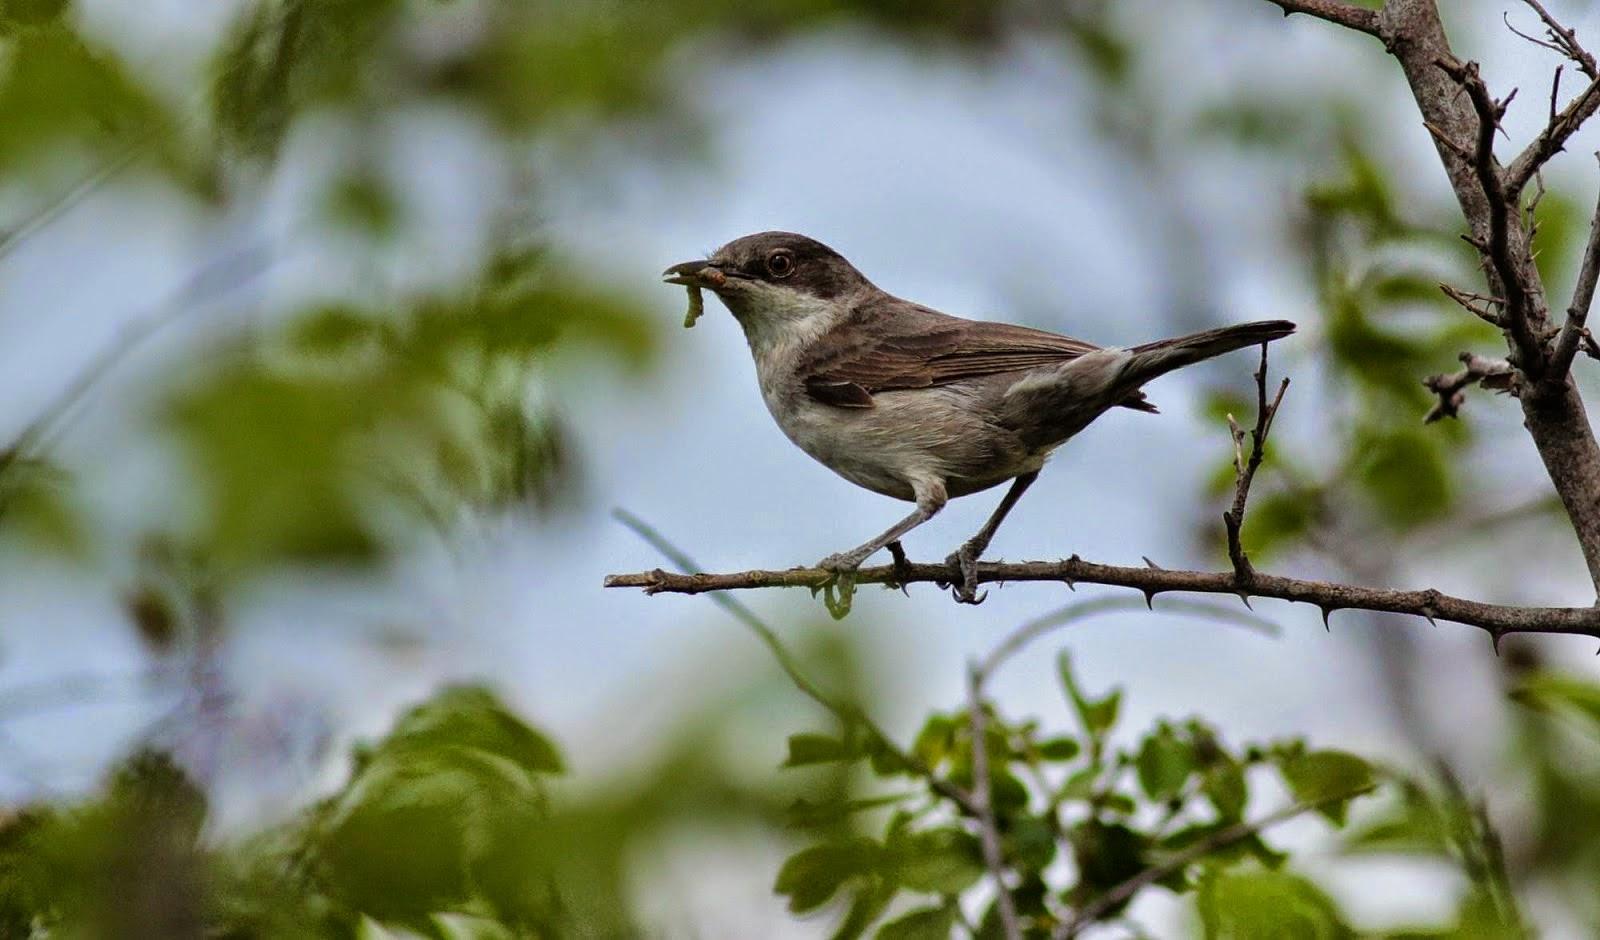 Eastern Orphean Warbler copyright Iordan Hristov